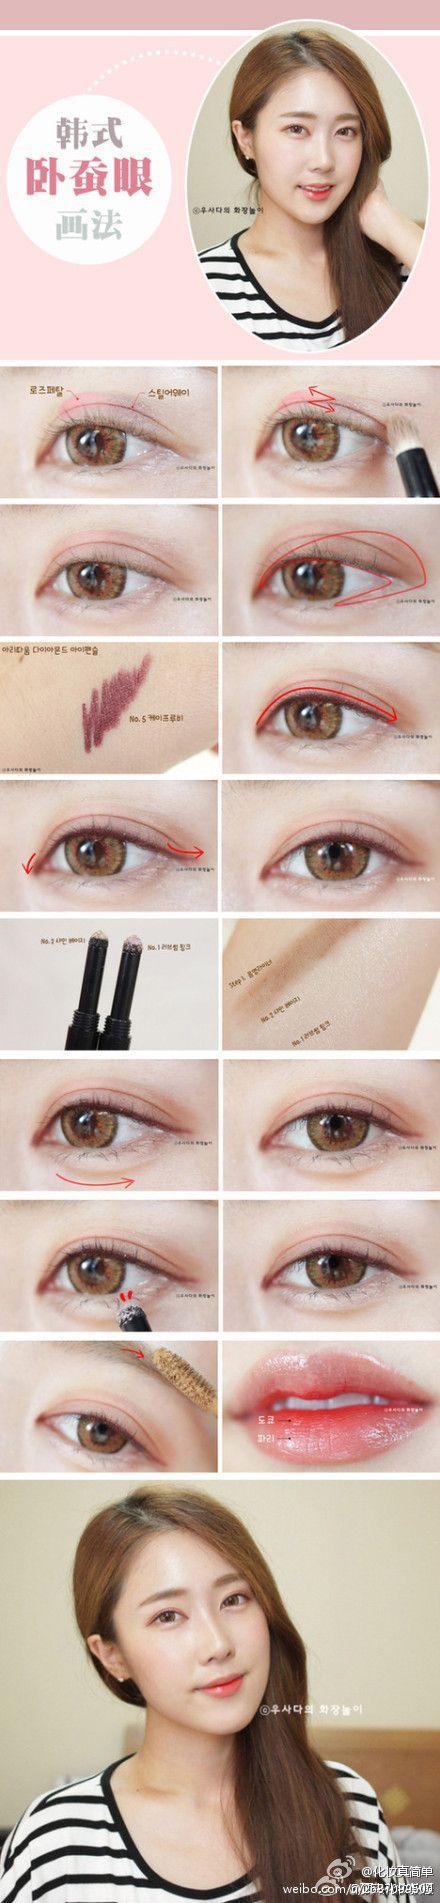 54 best make up images on pinterest makeup make up and asian beauty natural makeup look asian makeup ccuart Images